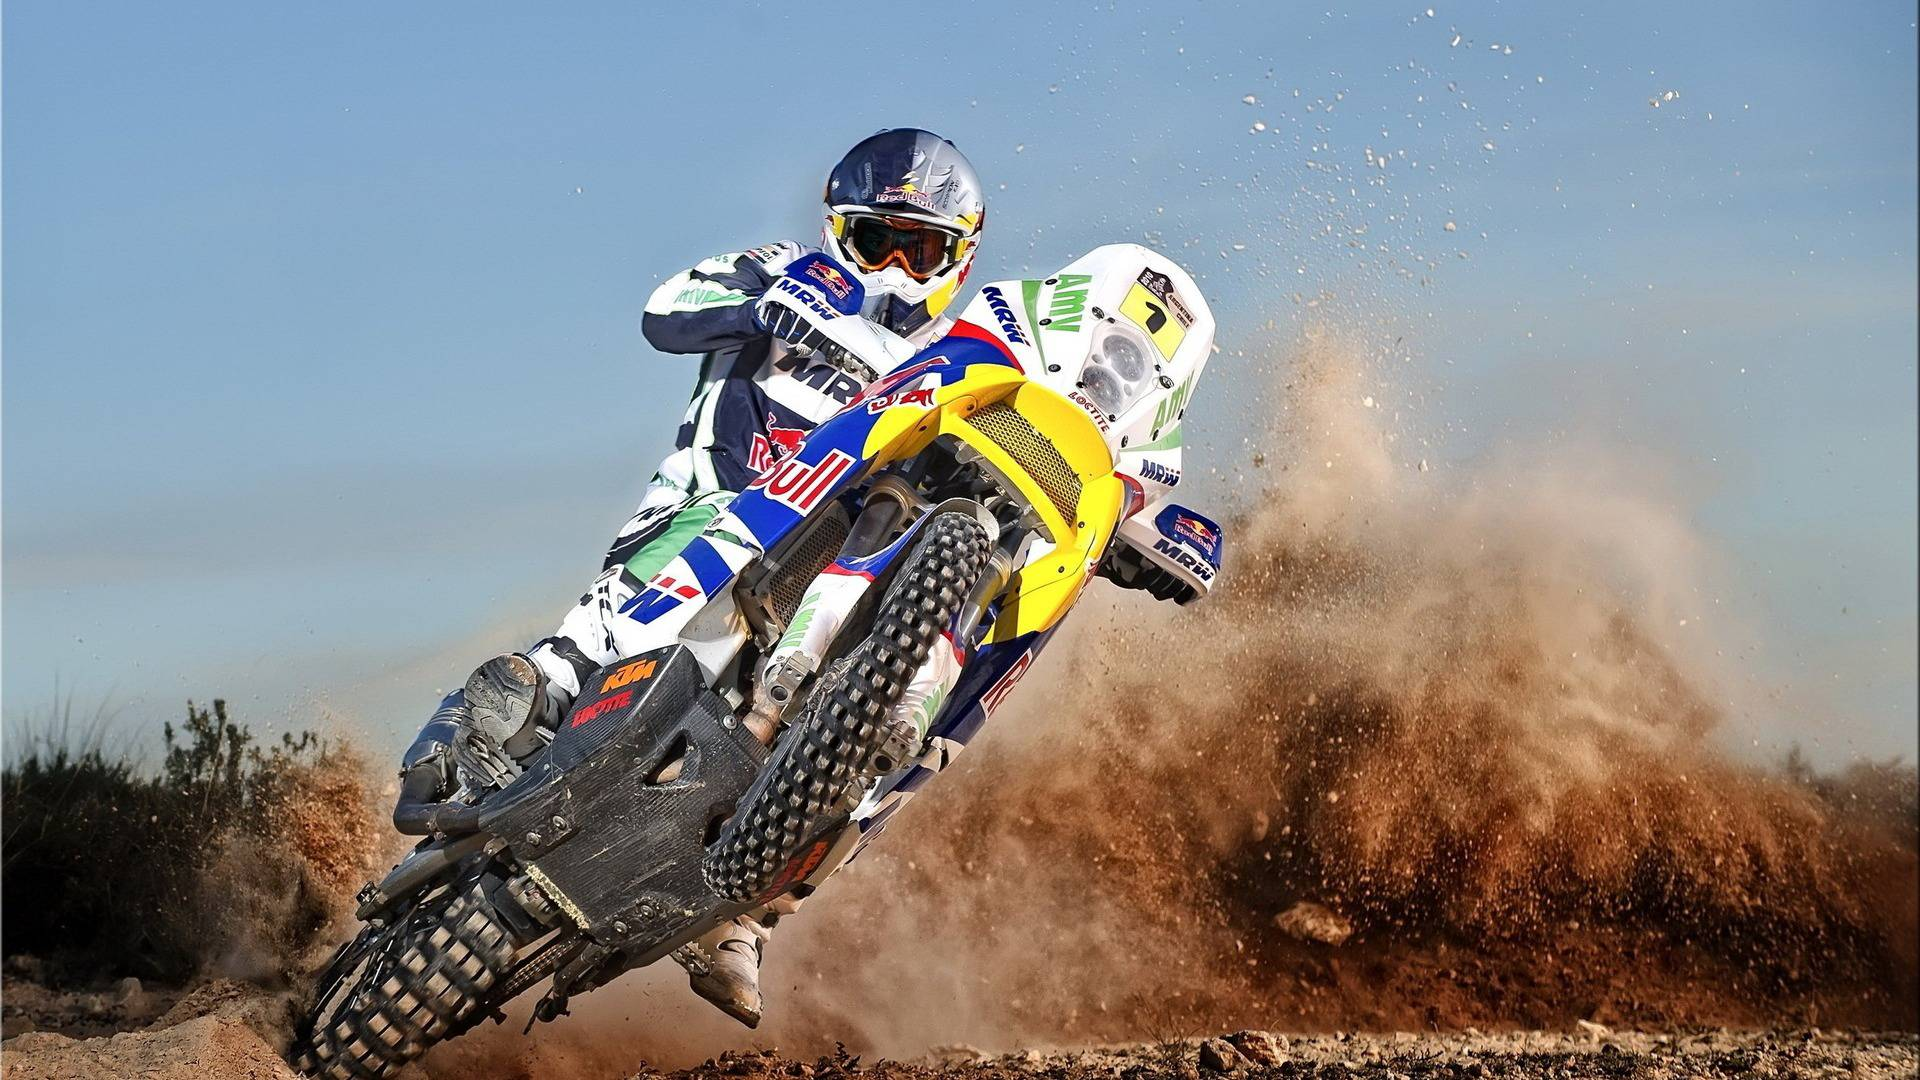 обои мотокросс, мотоцикл, пески, ралли картинки фото